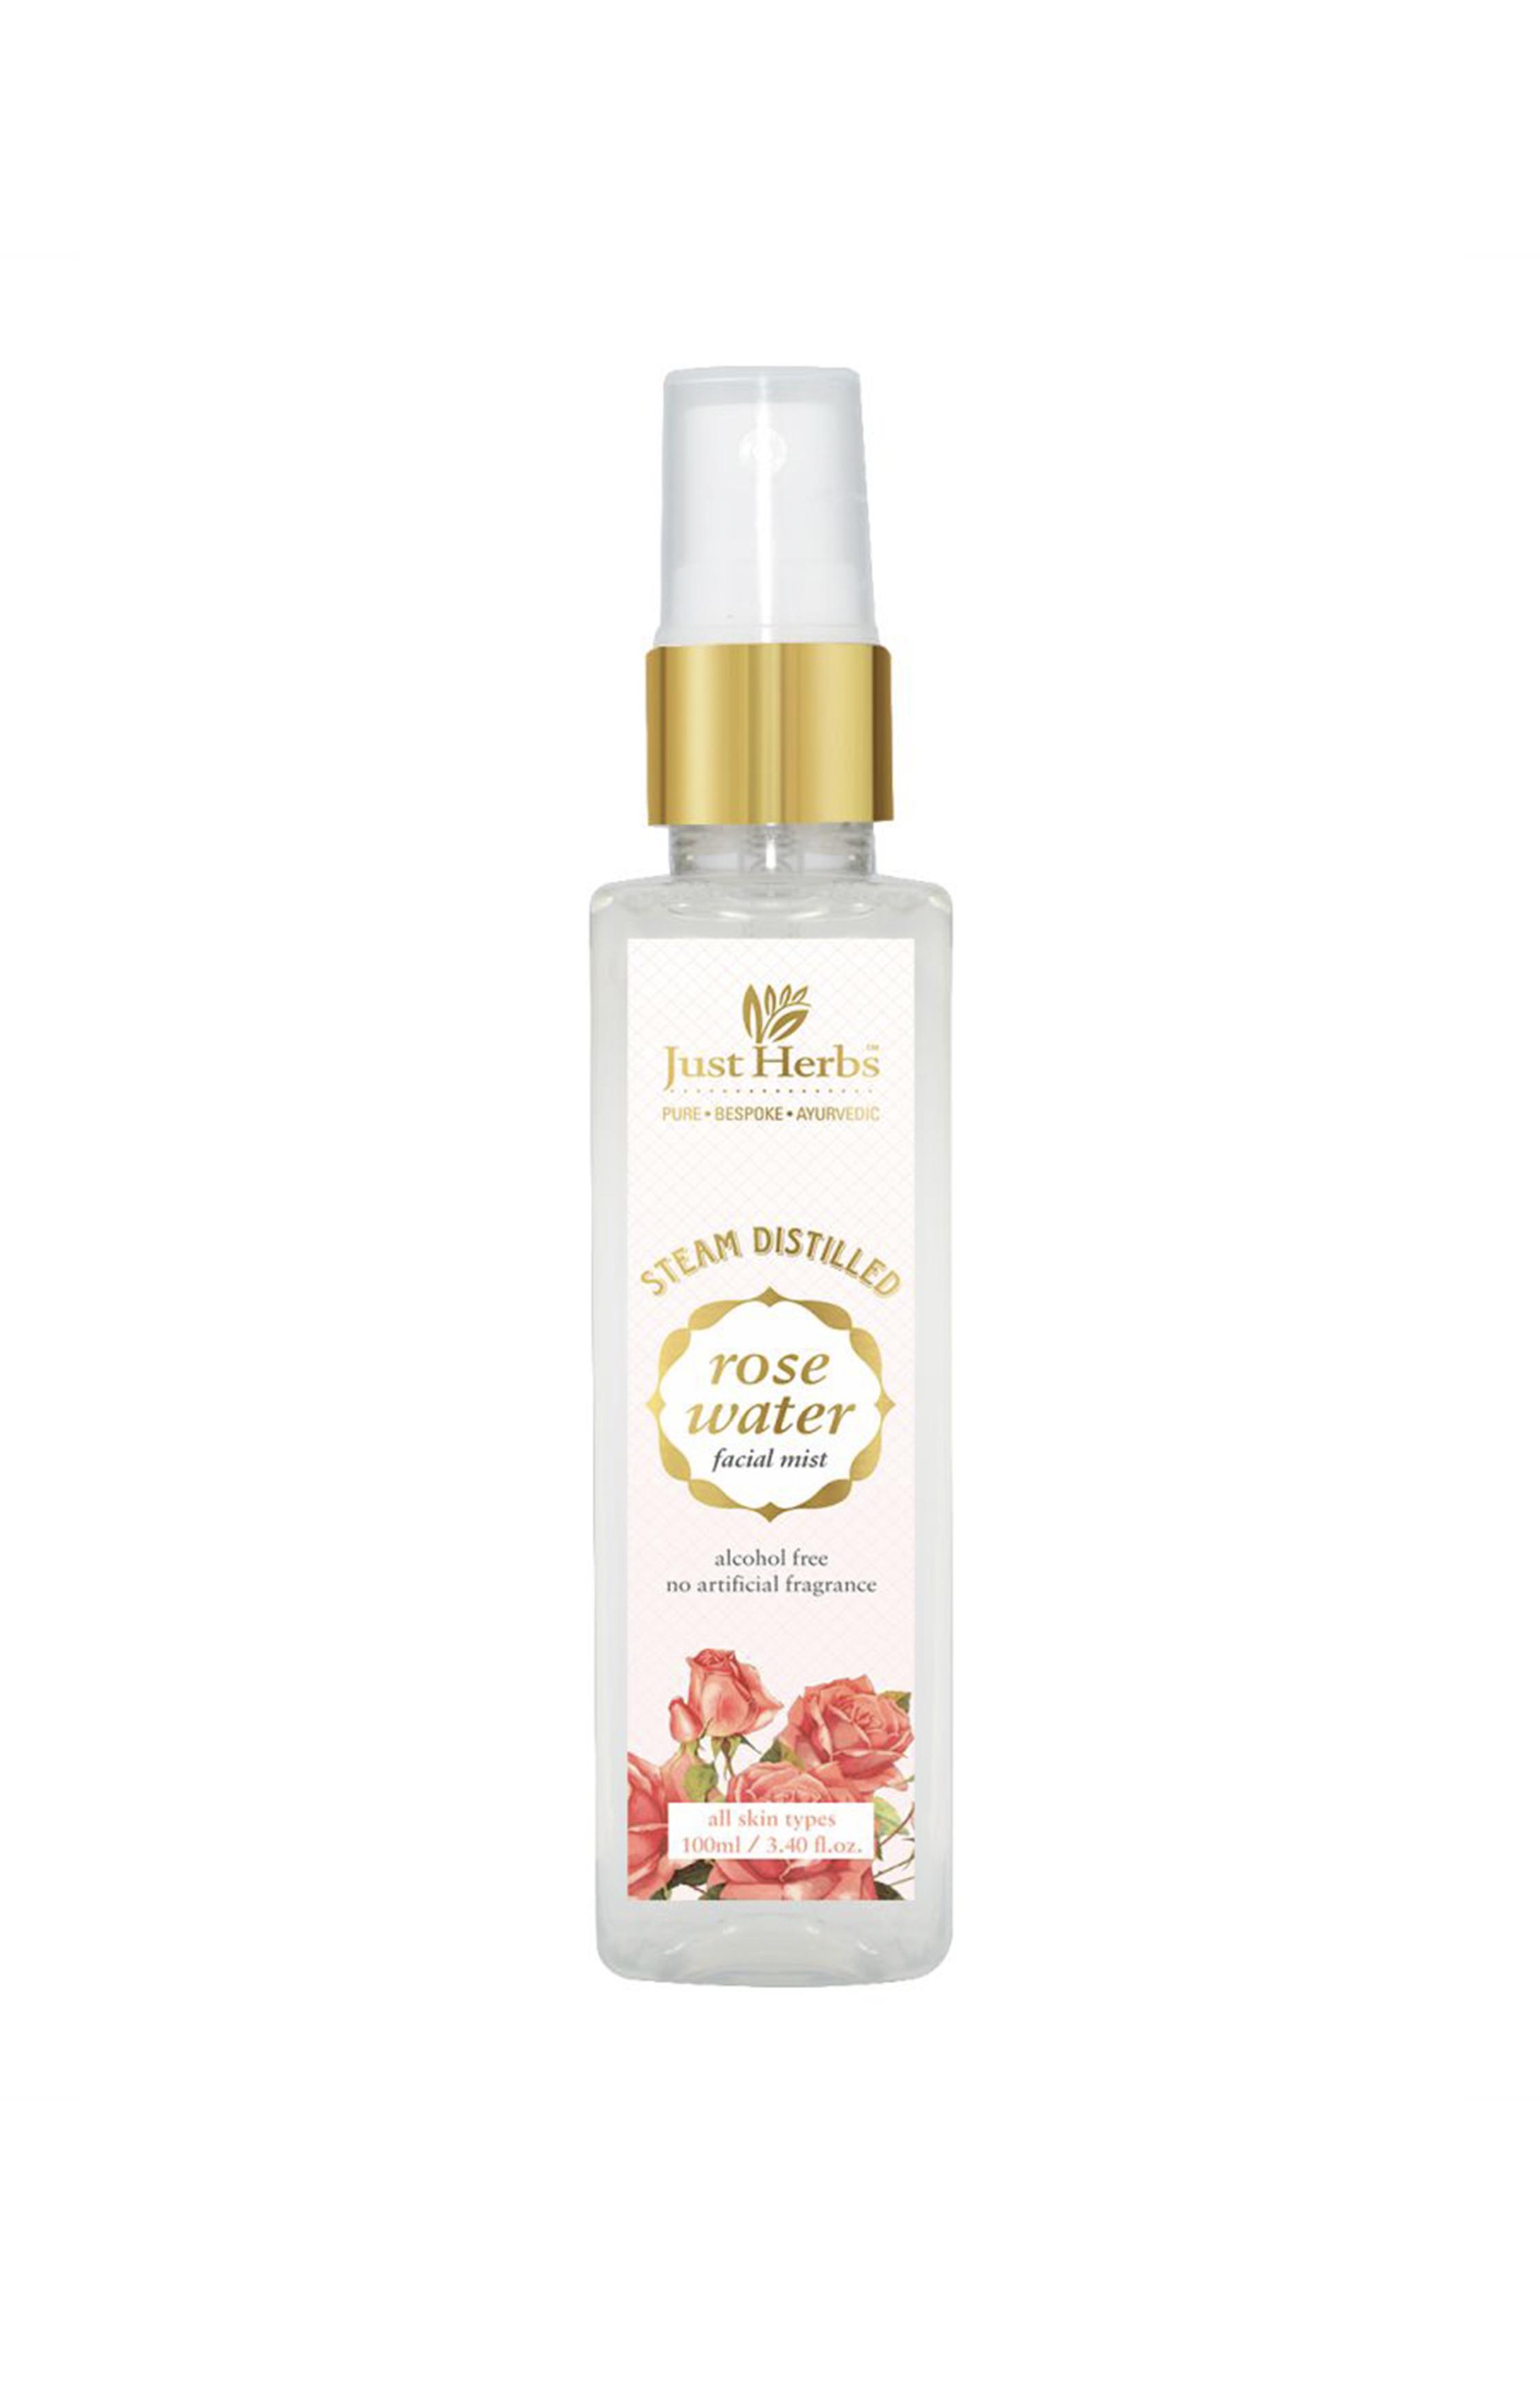 Just Herbs | Steam Distilled Rose Water Facial Mist